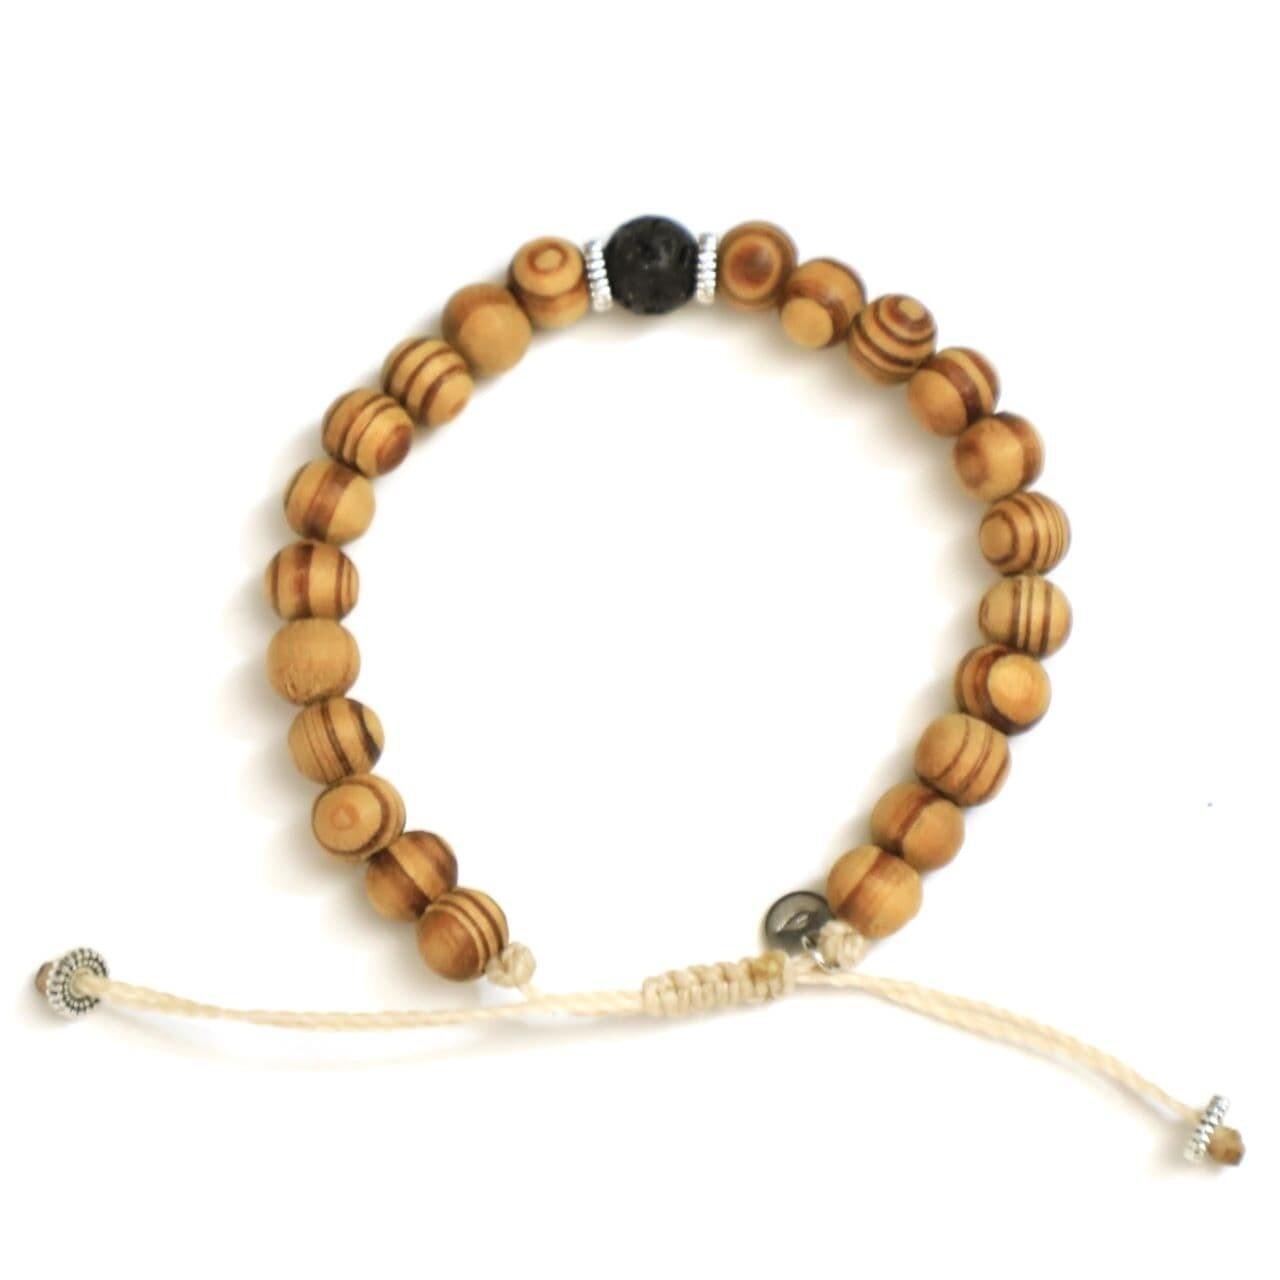 Brindle Diffuser Bracelet